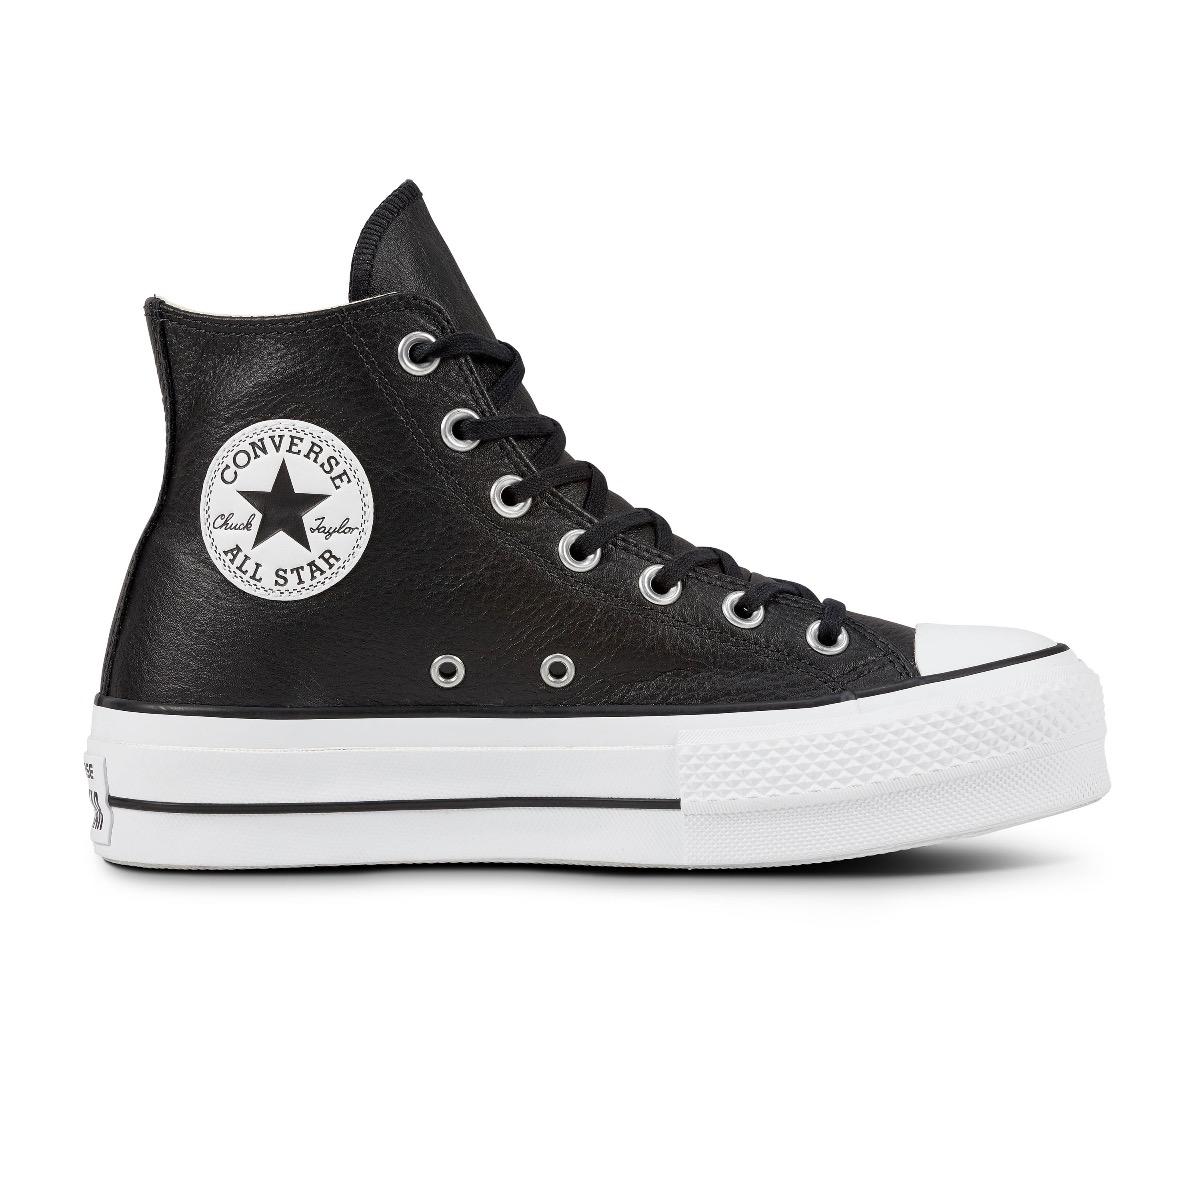 Converse All Stars Lift Clean 561675C Zwart - Wit maat